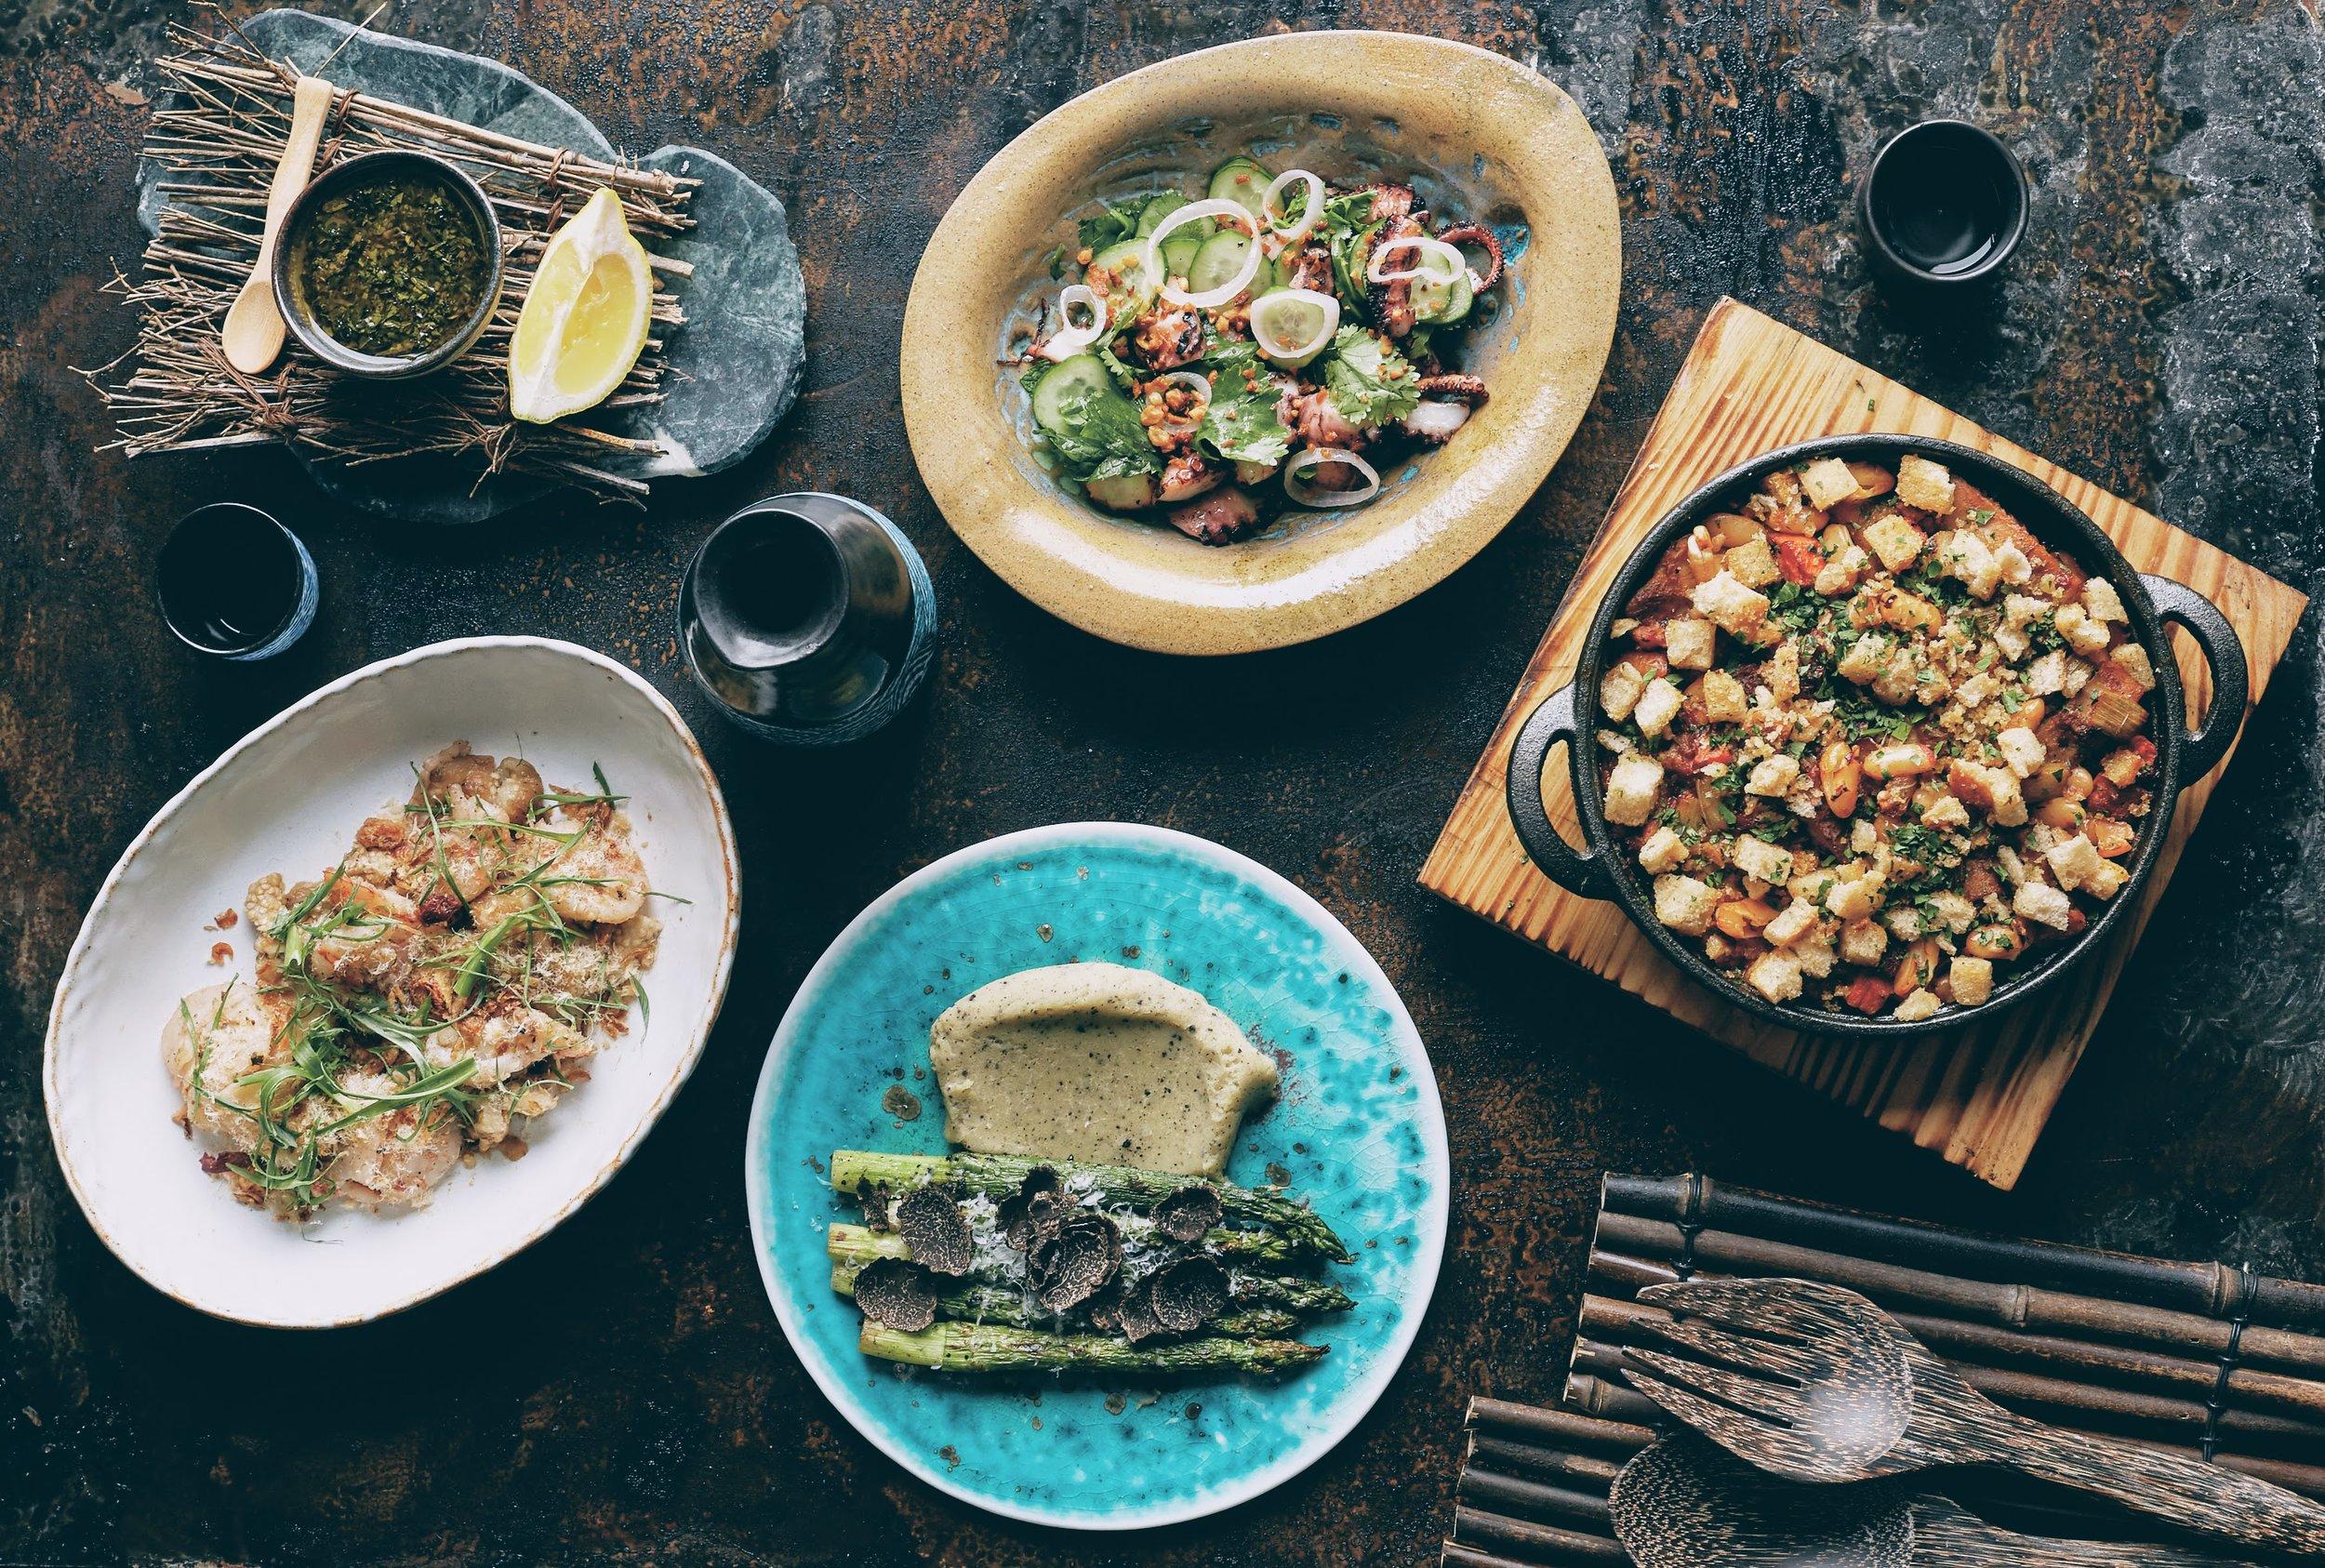 European comfort dishes with a twist a Rhoda / Photo: courtesy of Rhoda